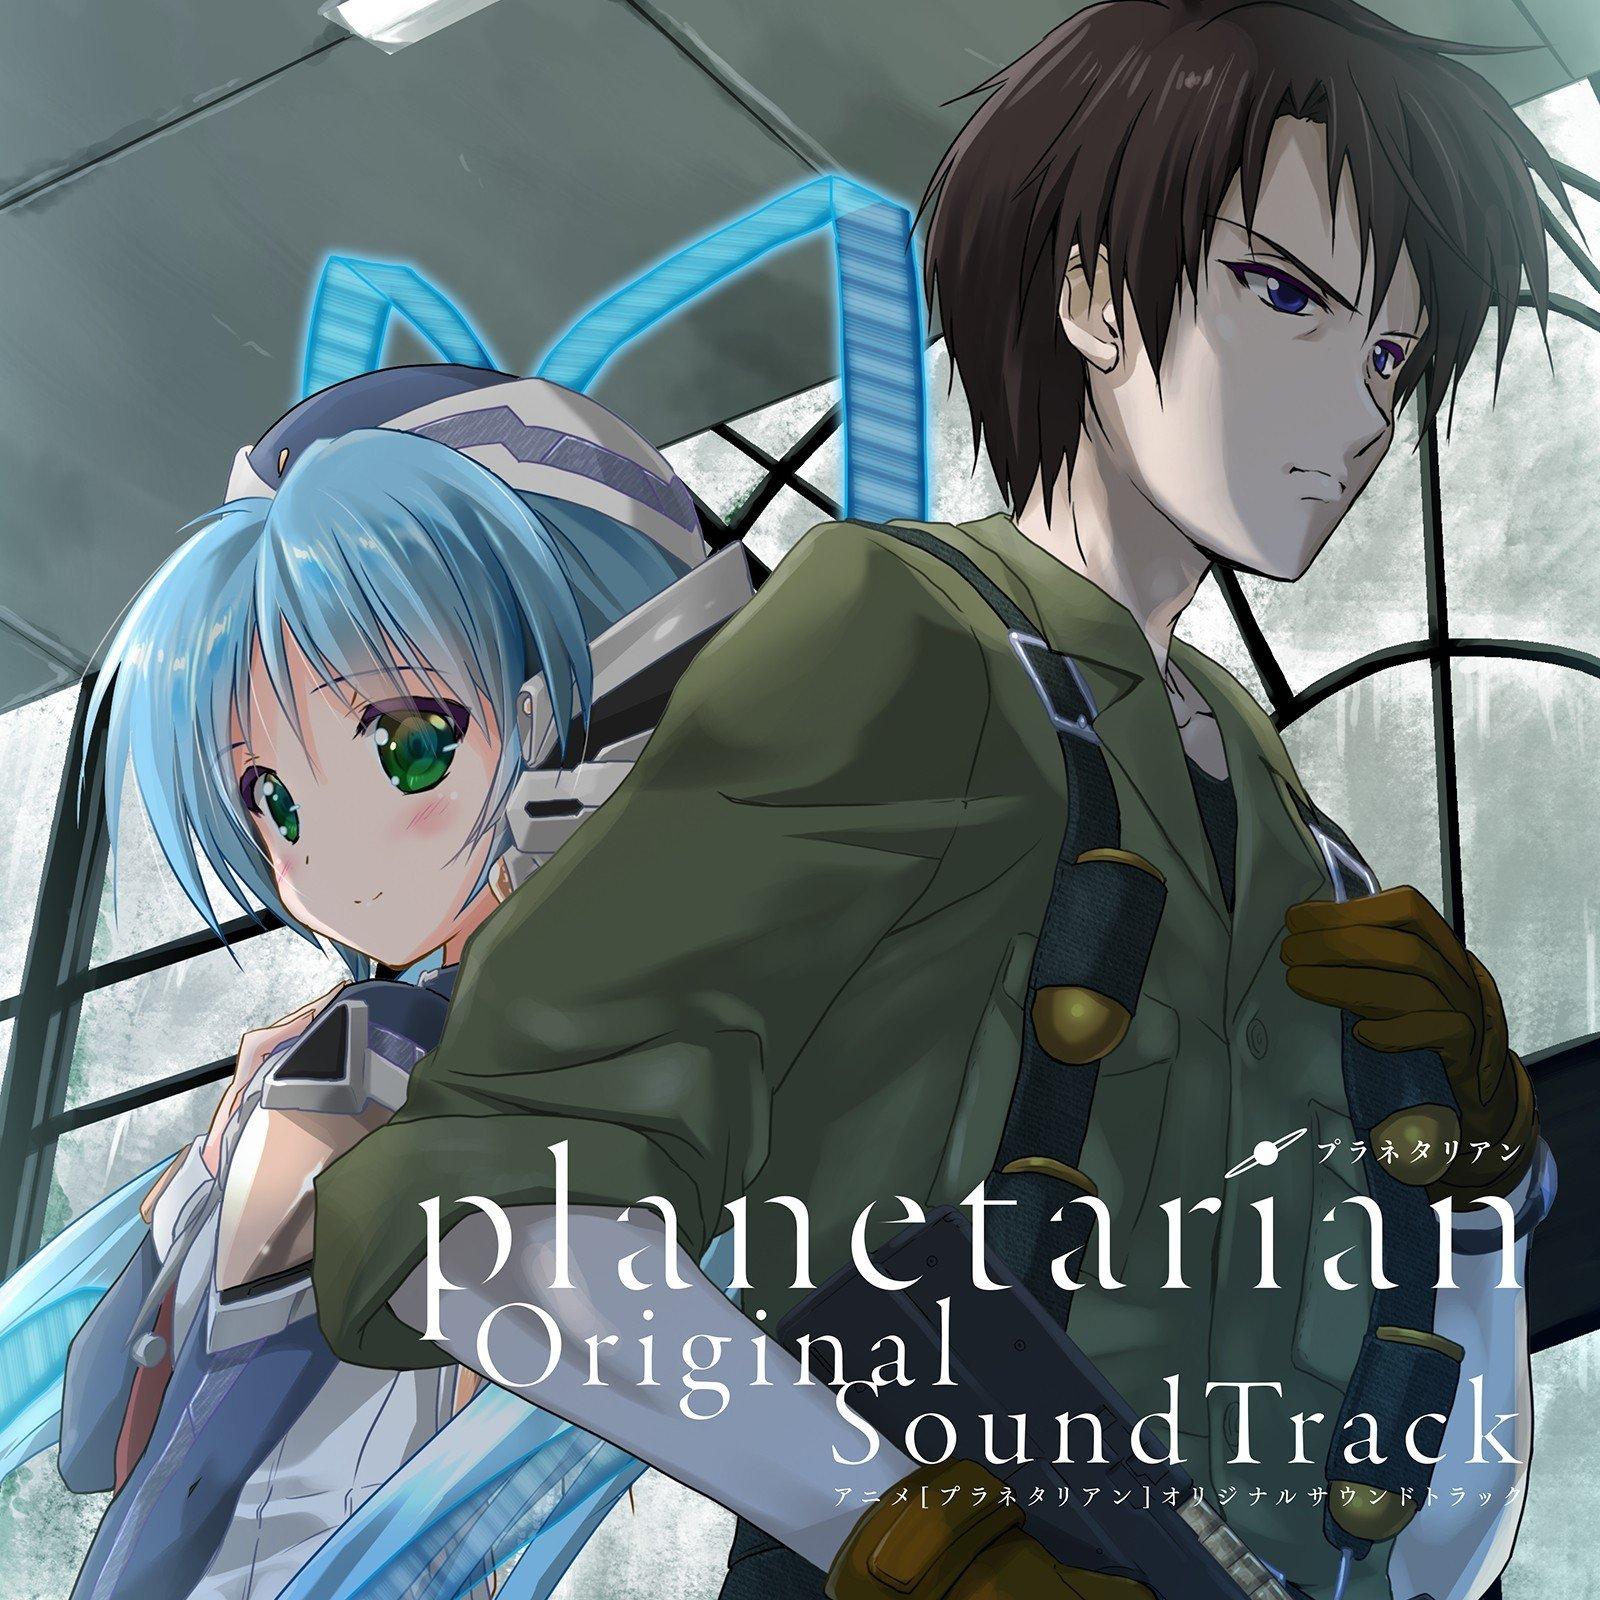 VA – アニメ「planetarian」 Original SoundTrack [FLAC / 24bit Lossless / WEB] [2016.10.26]